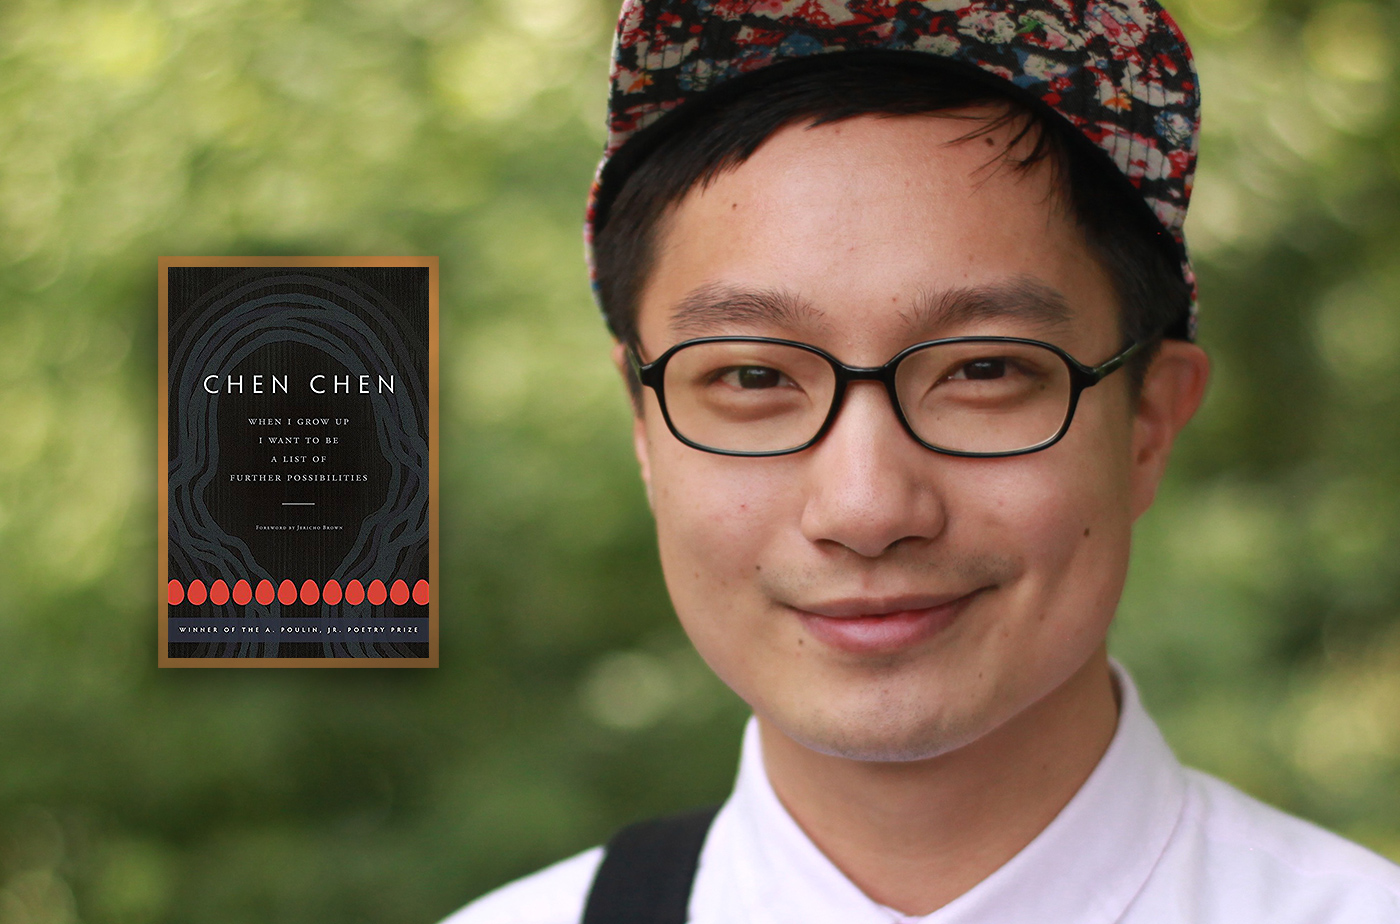 Catapult online classes: Chen Chen, 8-Week Online Poetry Workshop: Writing with Humor & Wonder, Poetry, Workshop